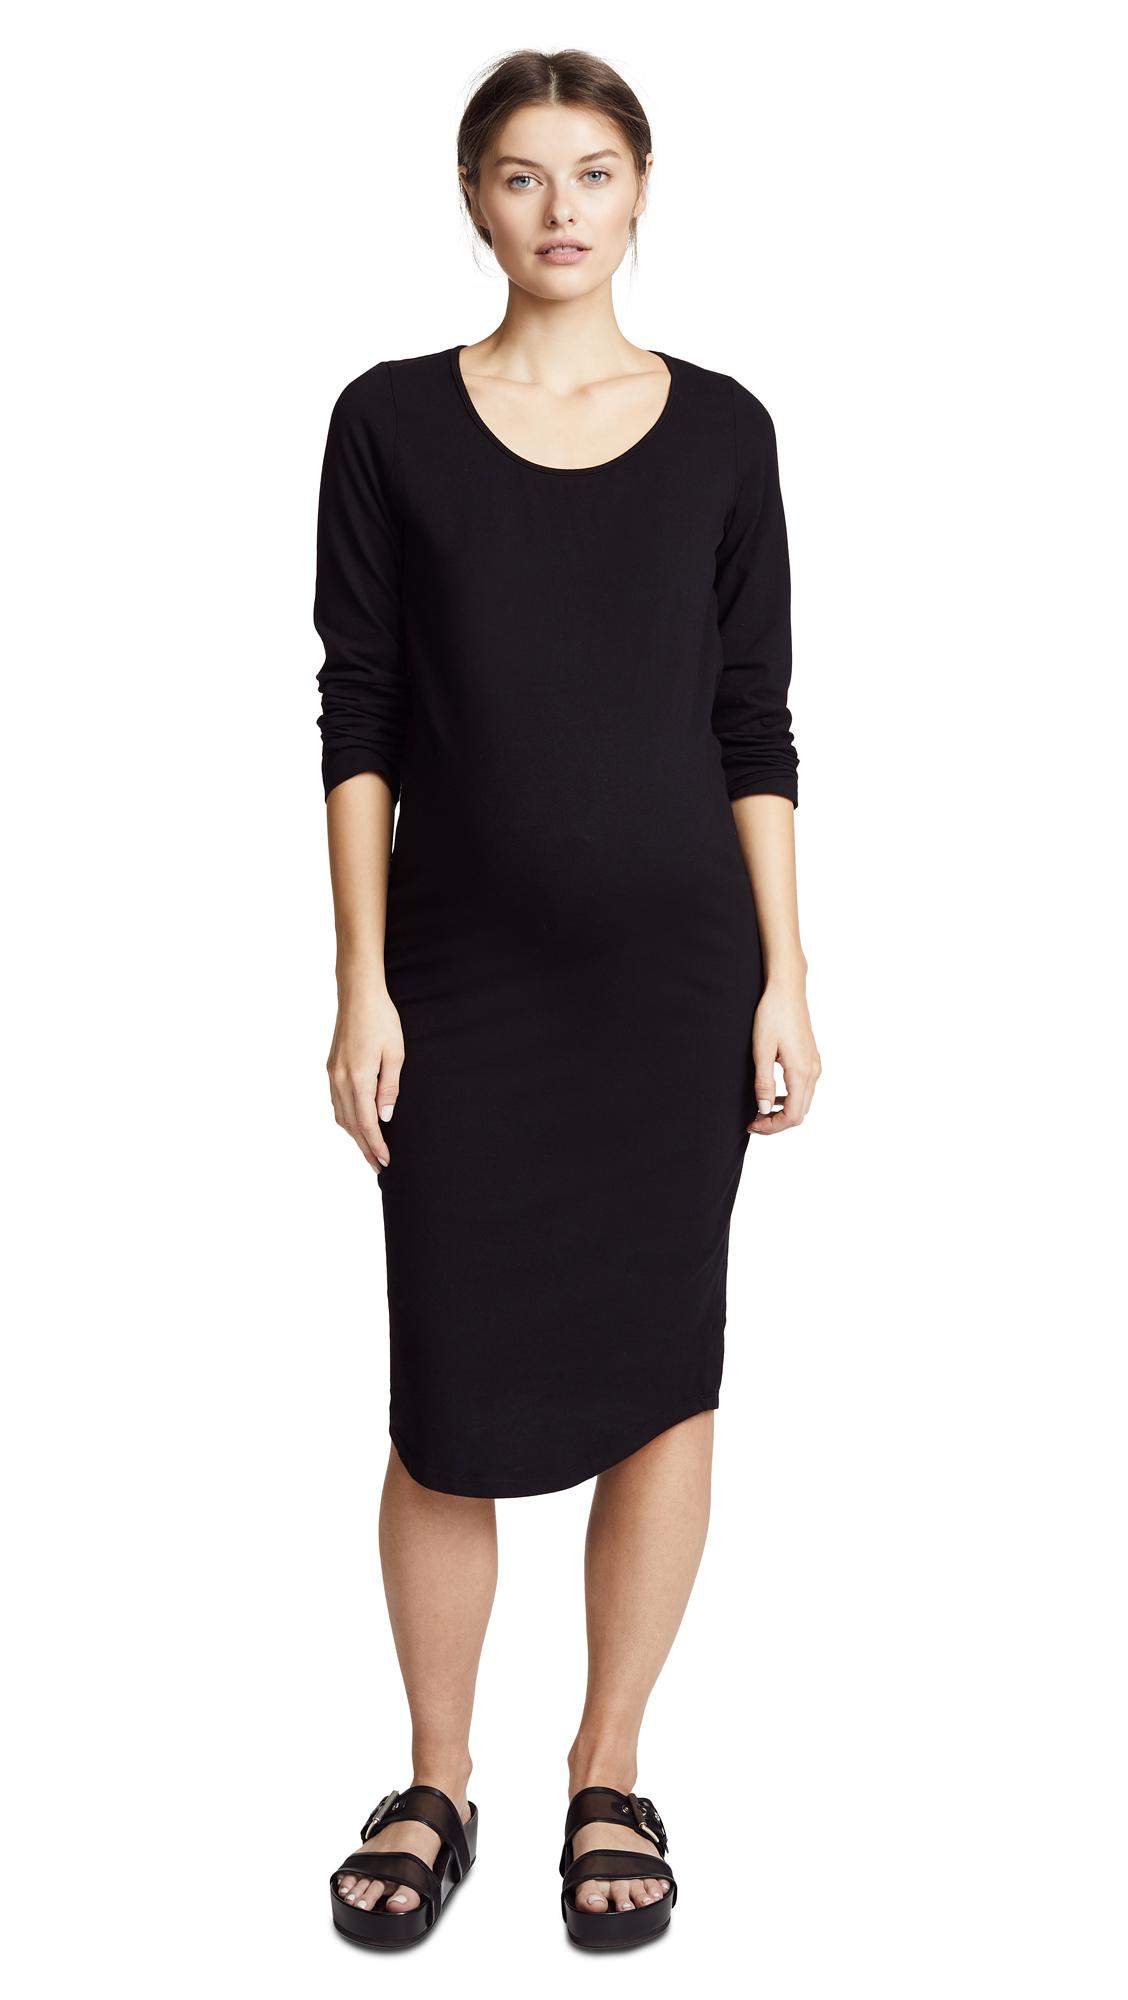 MONROW Maternity Long Sleeve Dress In Black